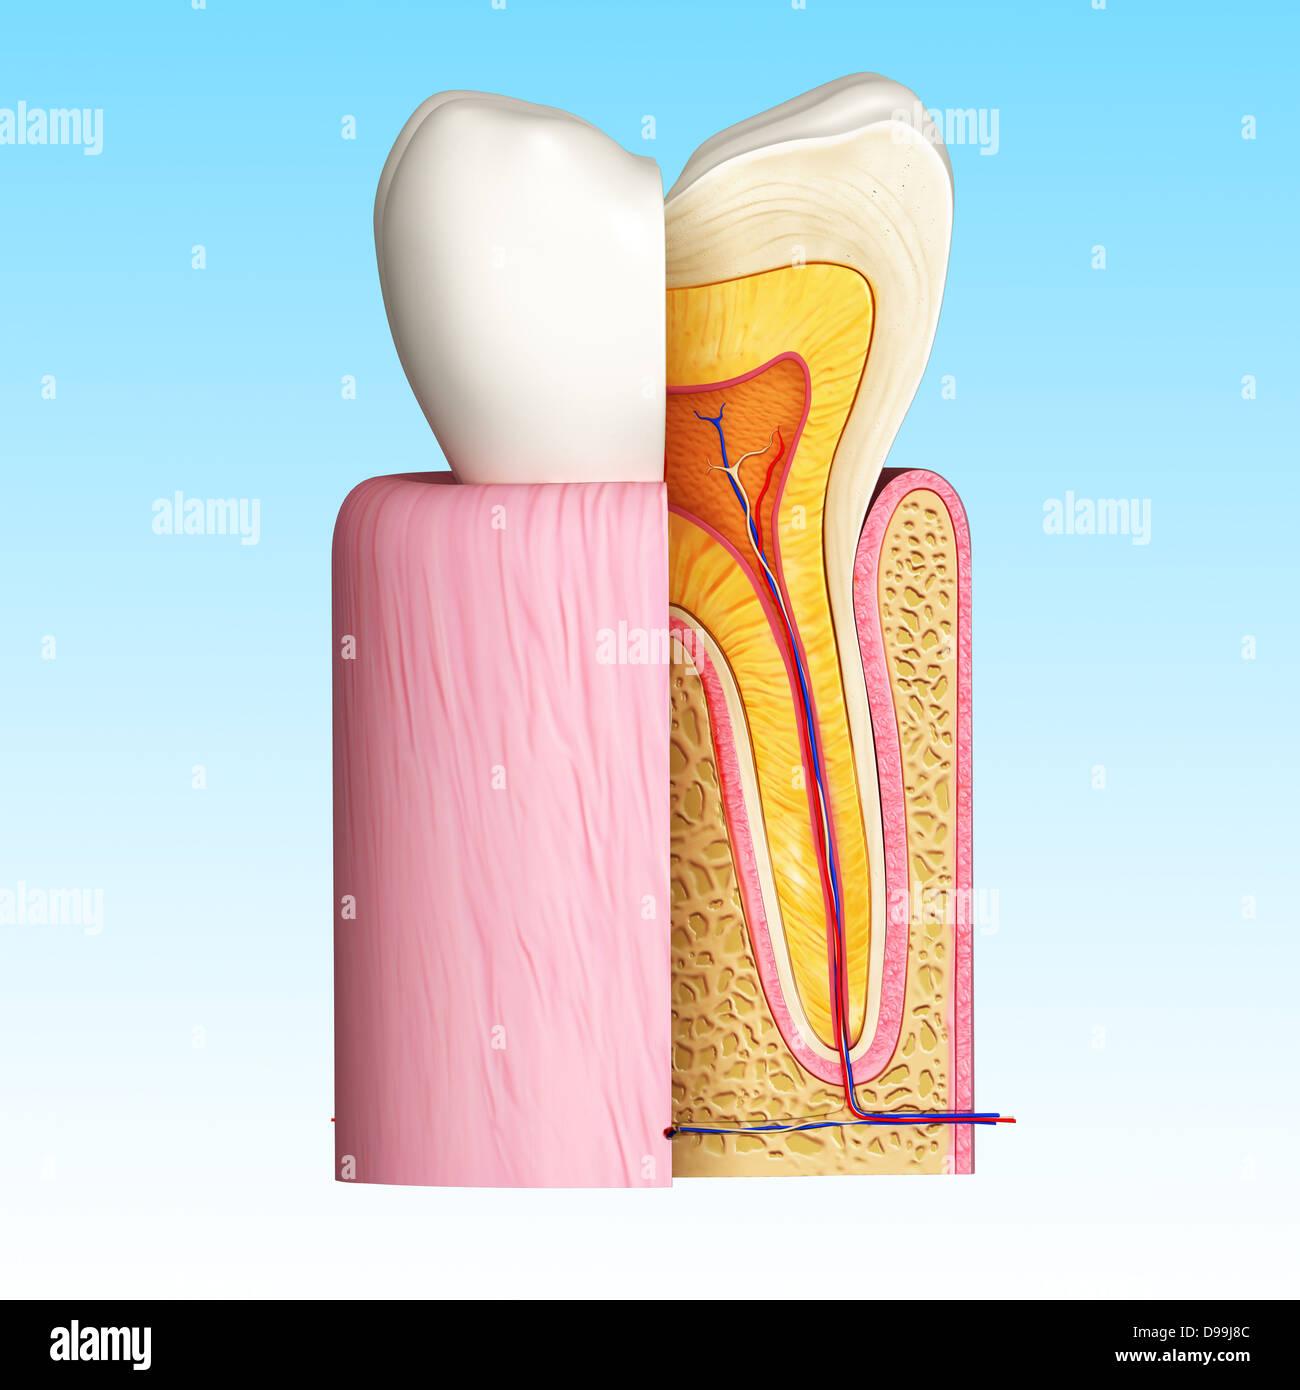 Digital Illustration Teeth Cross Section Stock Photos & Digital ...